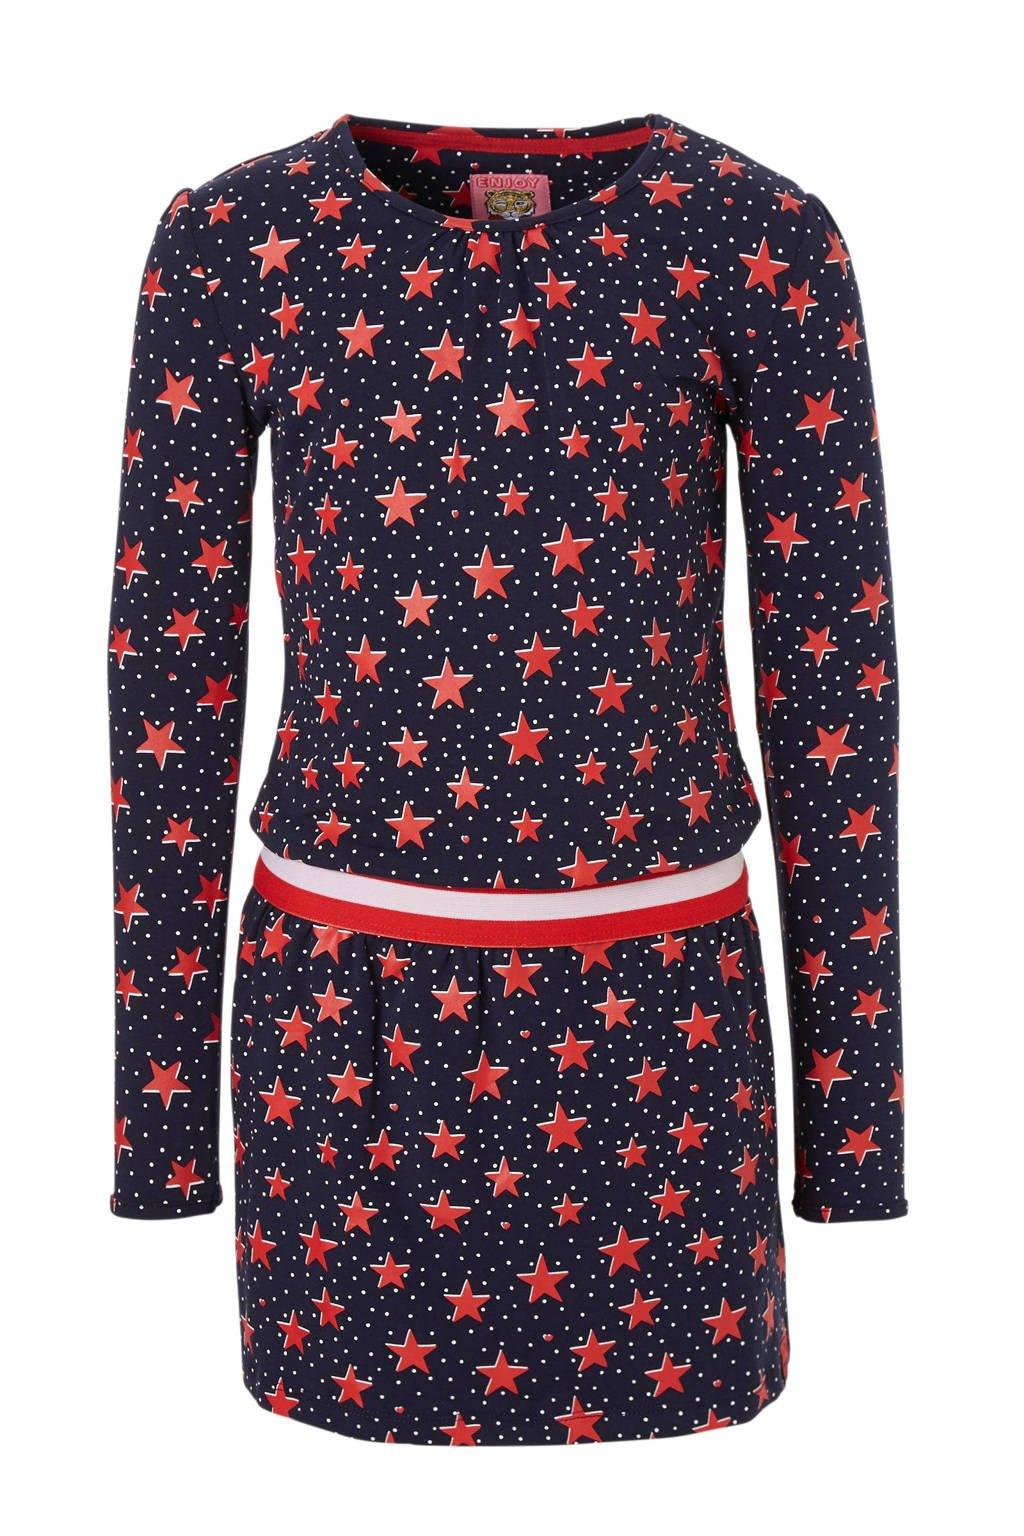 Z8 jurk Fleur met sterren en stippen blauw, Blauw/rood/wit